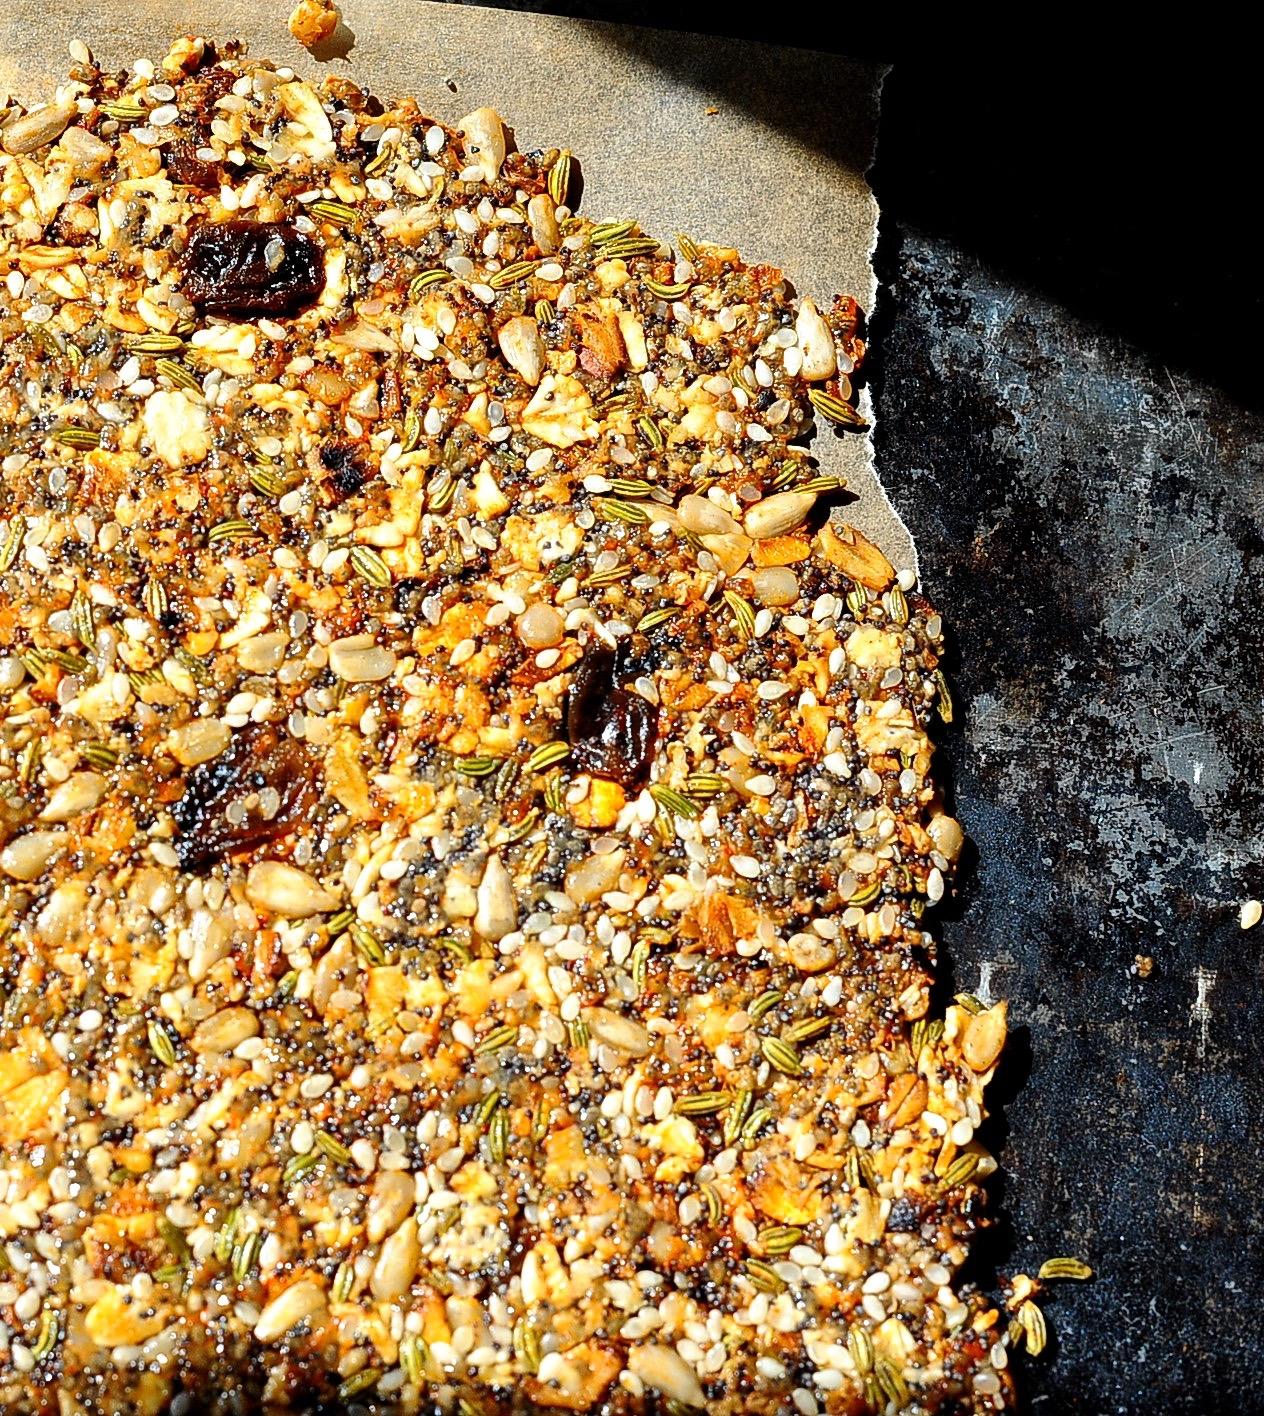 Seeded Rosemary Crackers (Vegan, Paleo, Gluten Free)